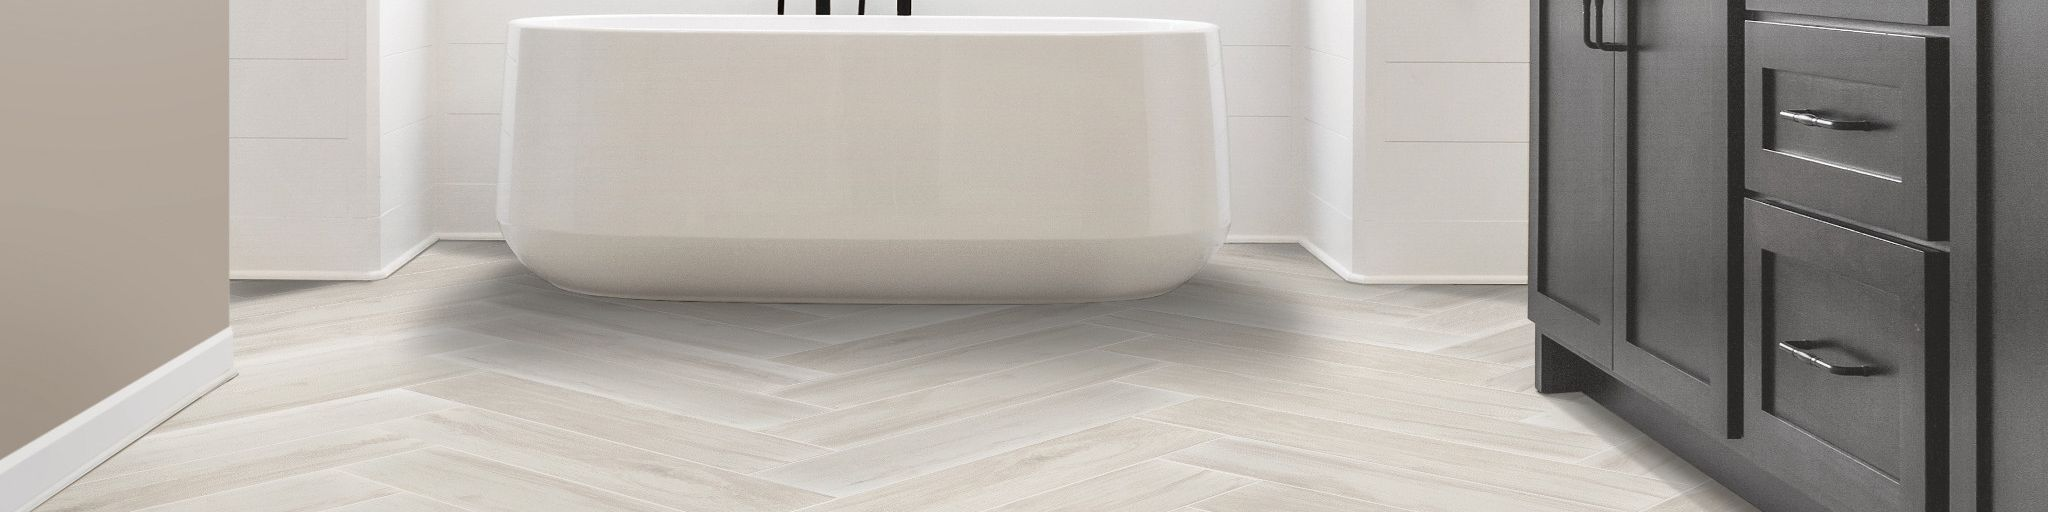 Tile and Stone Regent-291ts-00100-snow-8x36-bathroom-2020